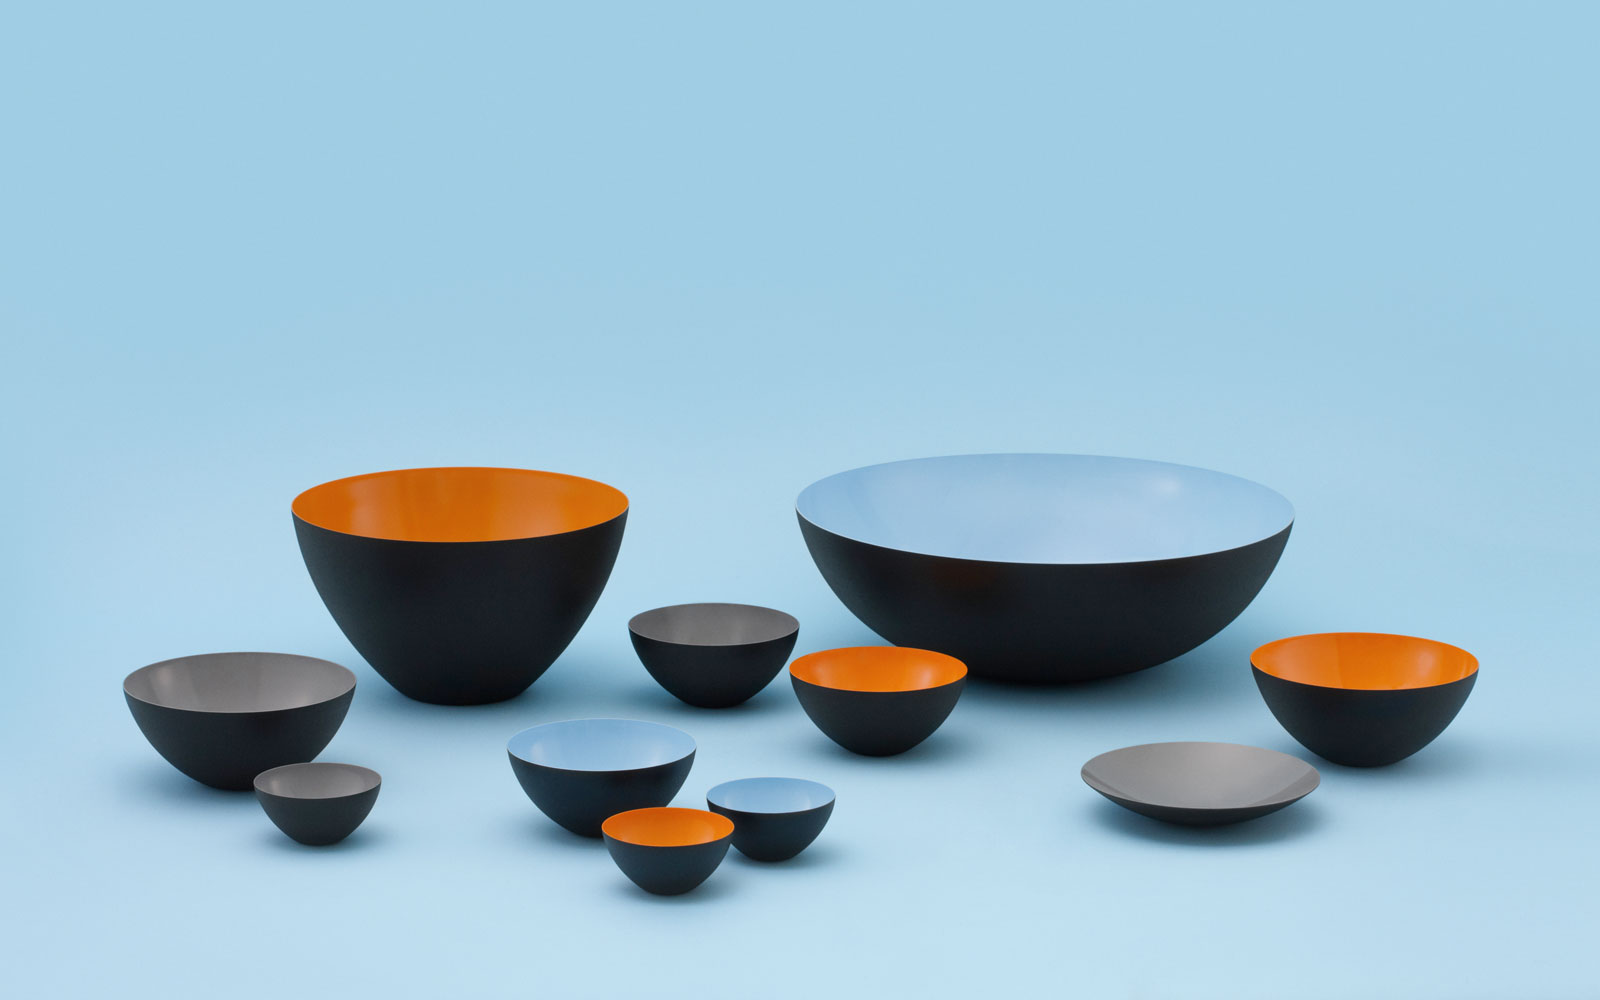 grey krenit bowl 25 cm a modern classic by normann copenhagen. Black Bedroom Furniture Sets. Home Design Ideas